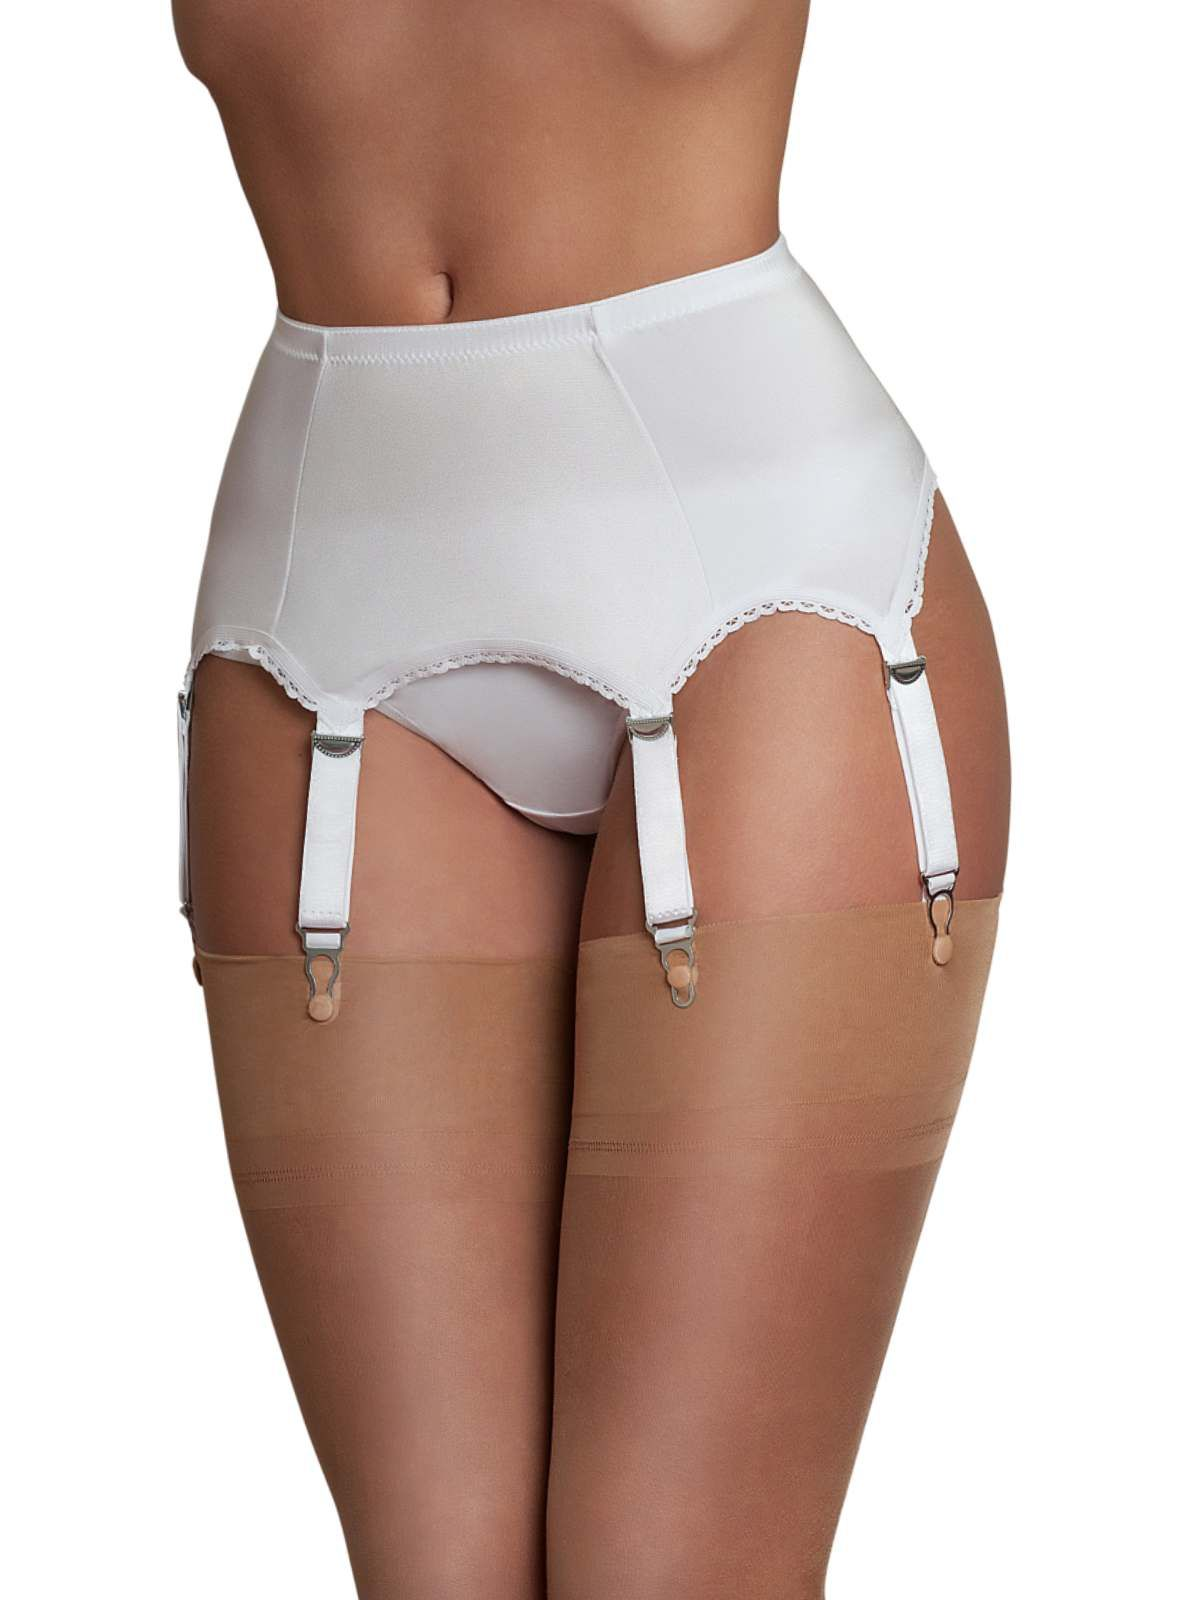 Pin On 6 Suspender Garter Belts